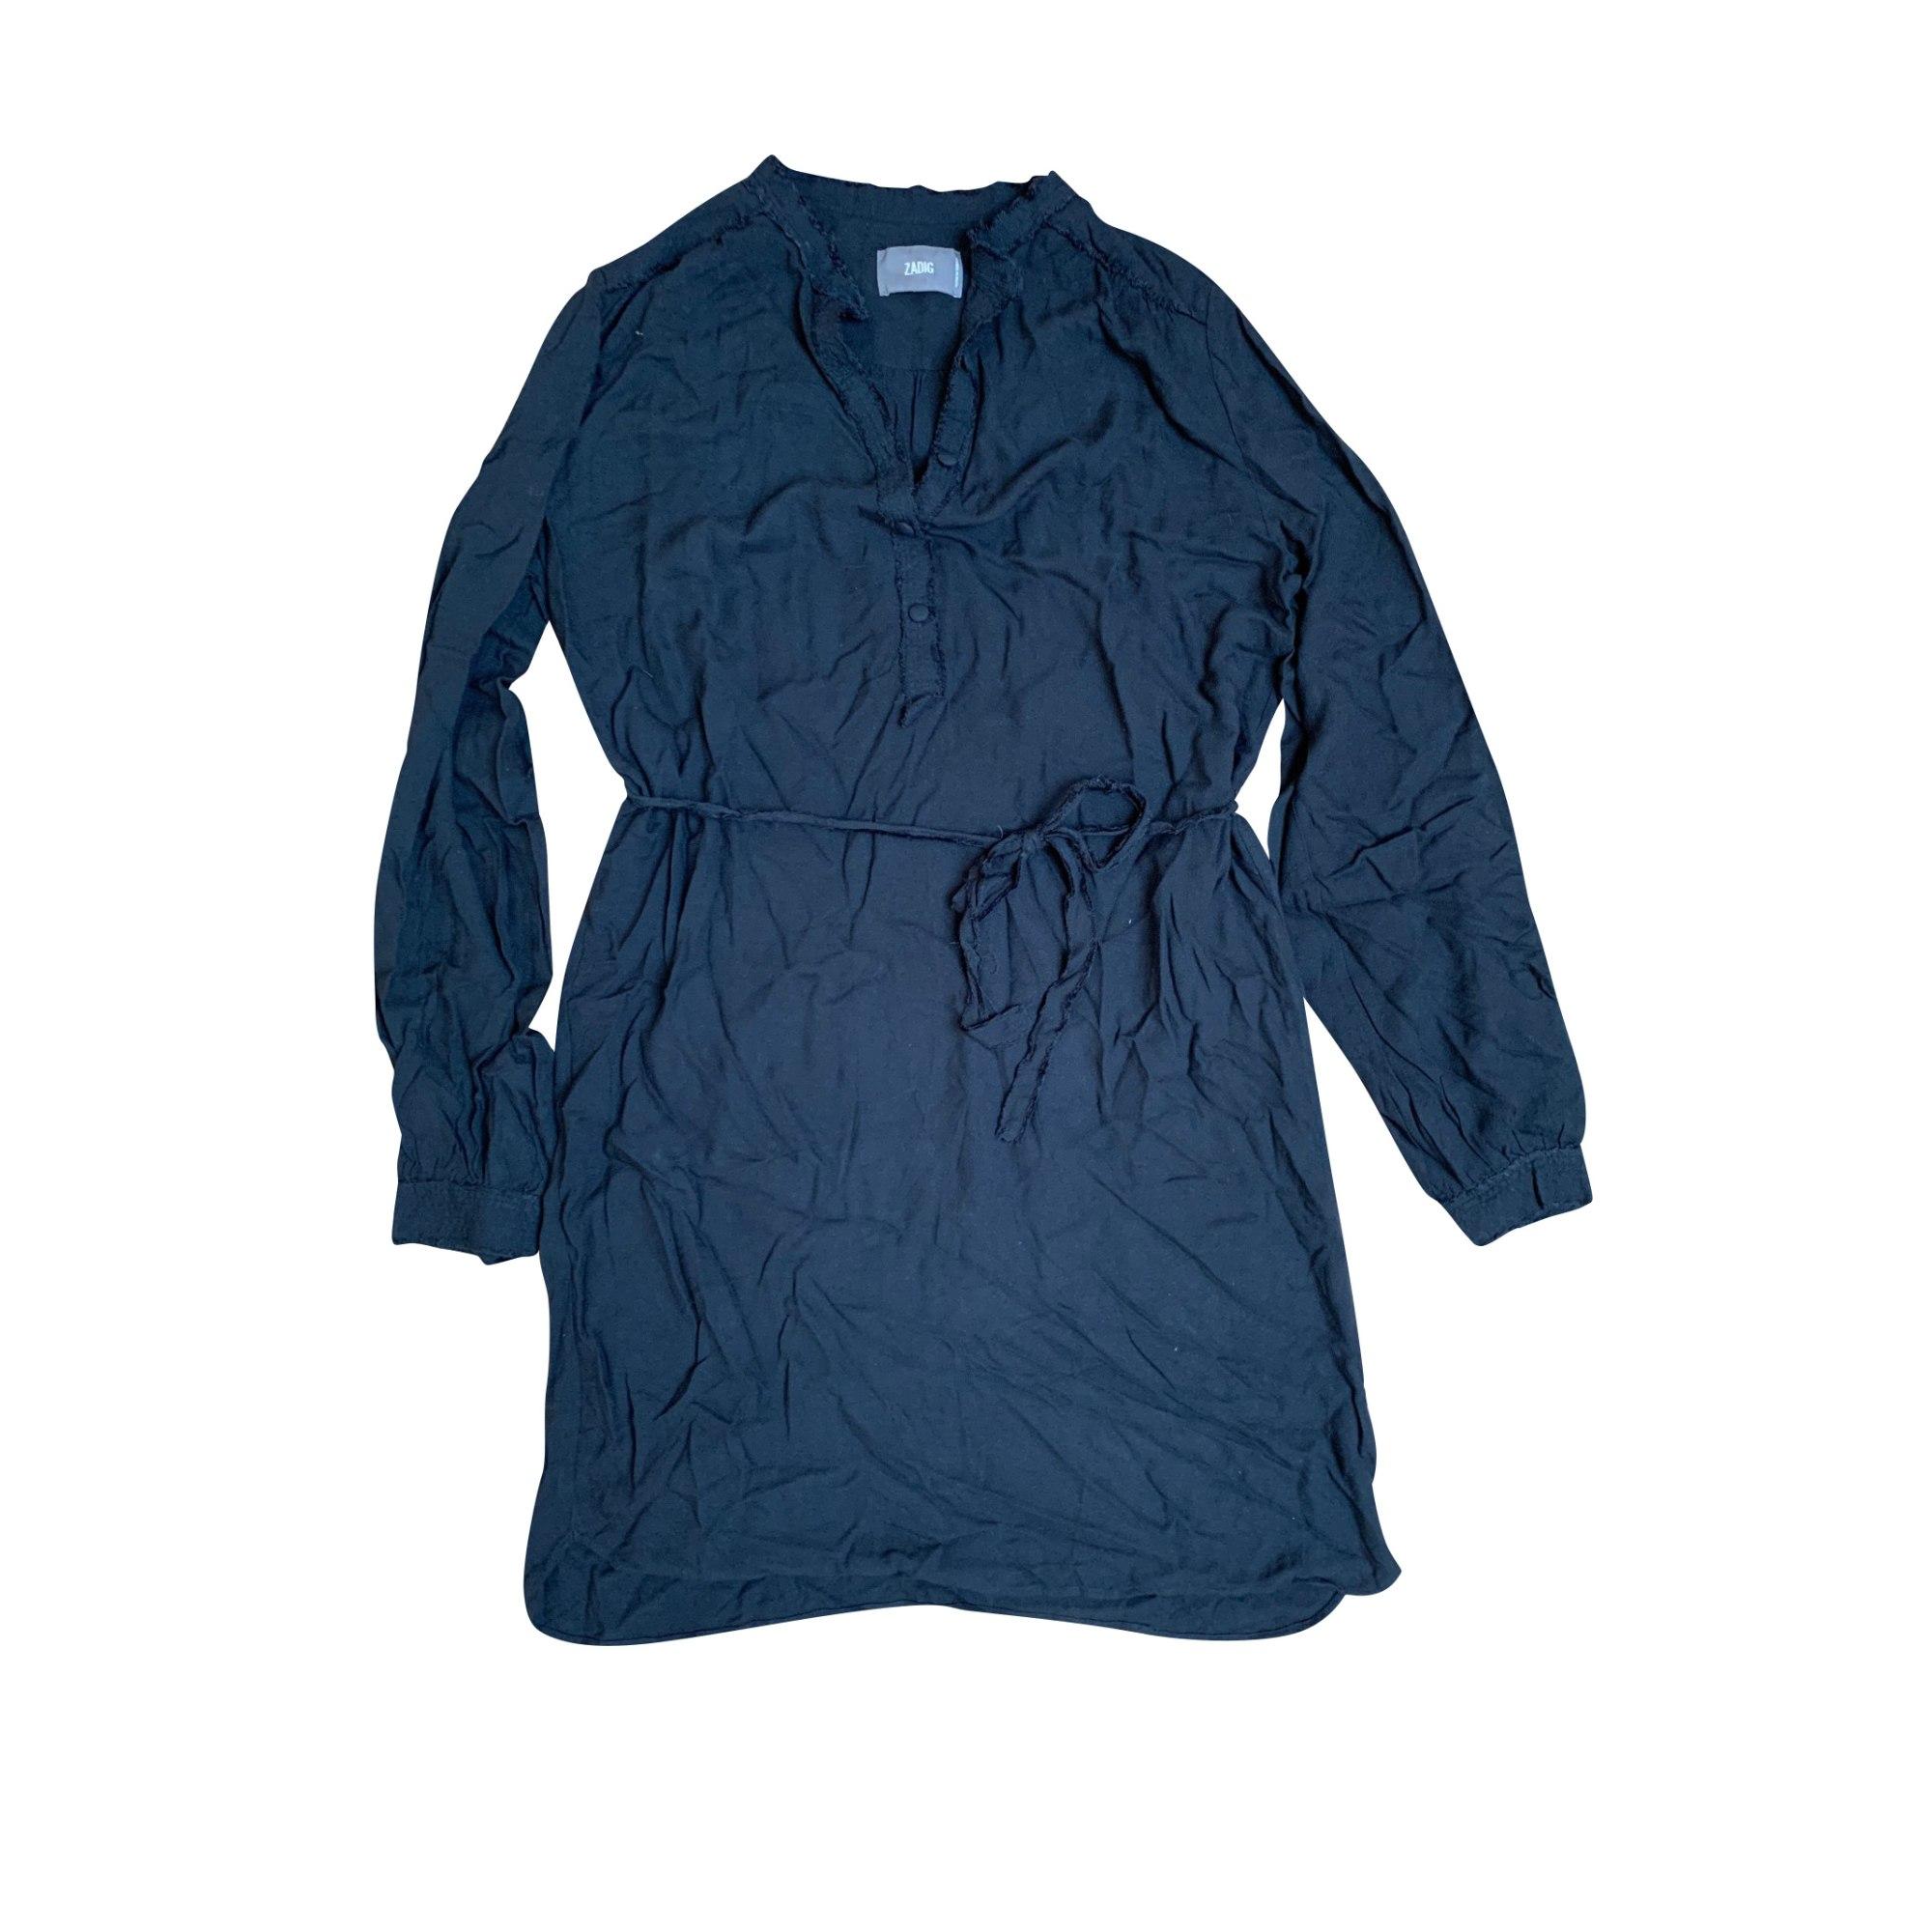 Robe longue ZADIG & VOLTAIRE Noir